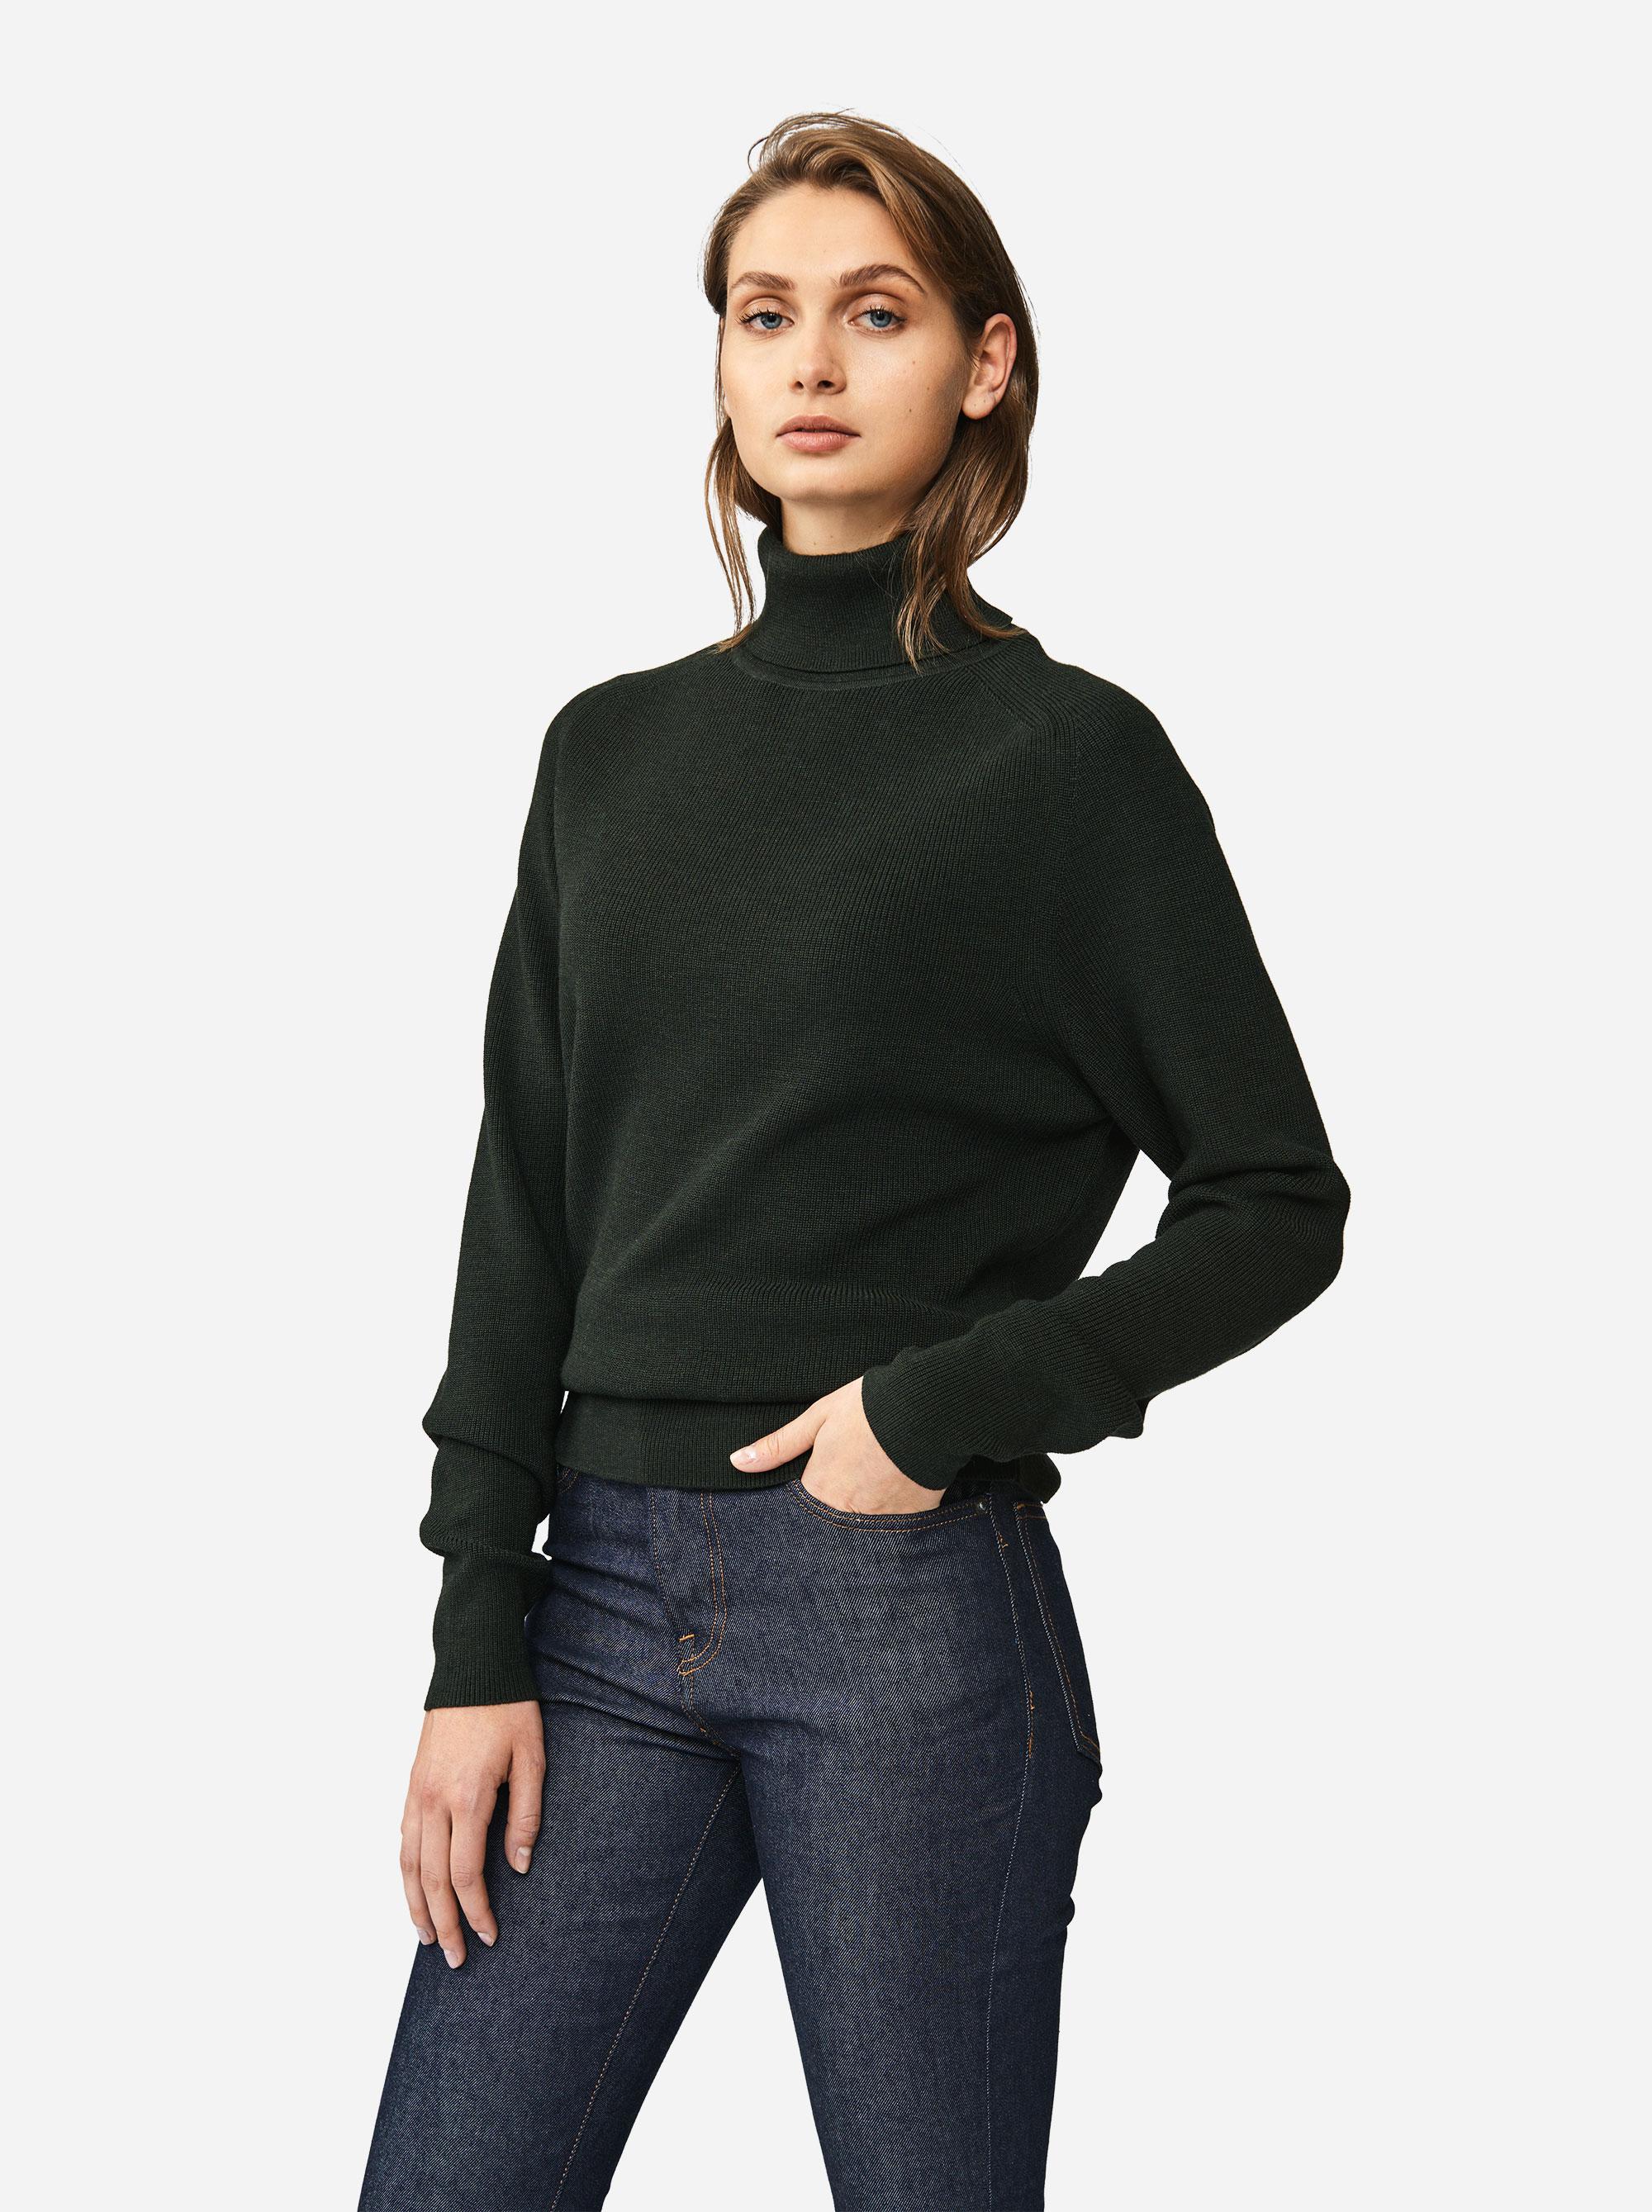 Teym - Turtleneck - The Merino Sweater - Women - Green - 1